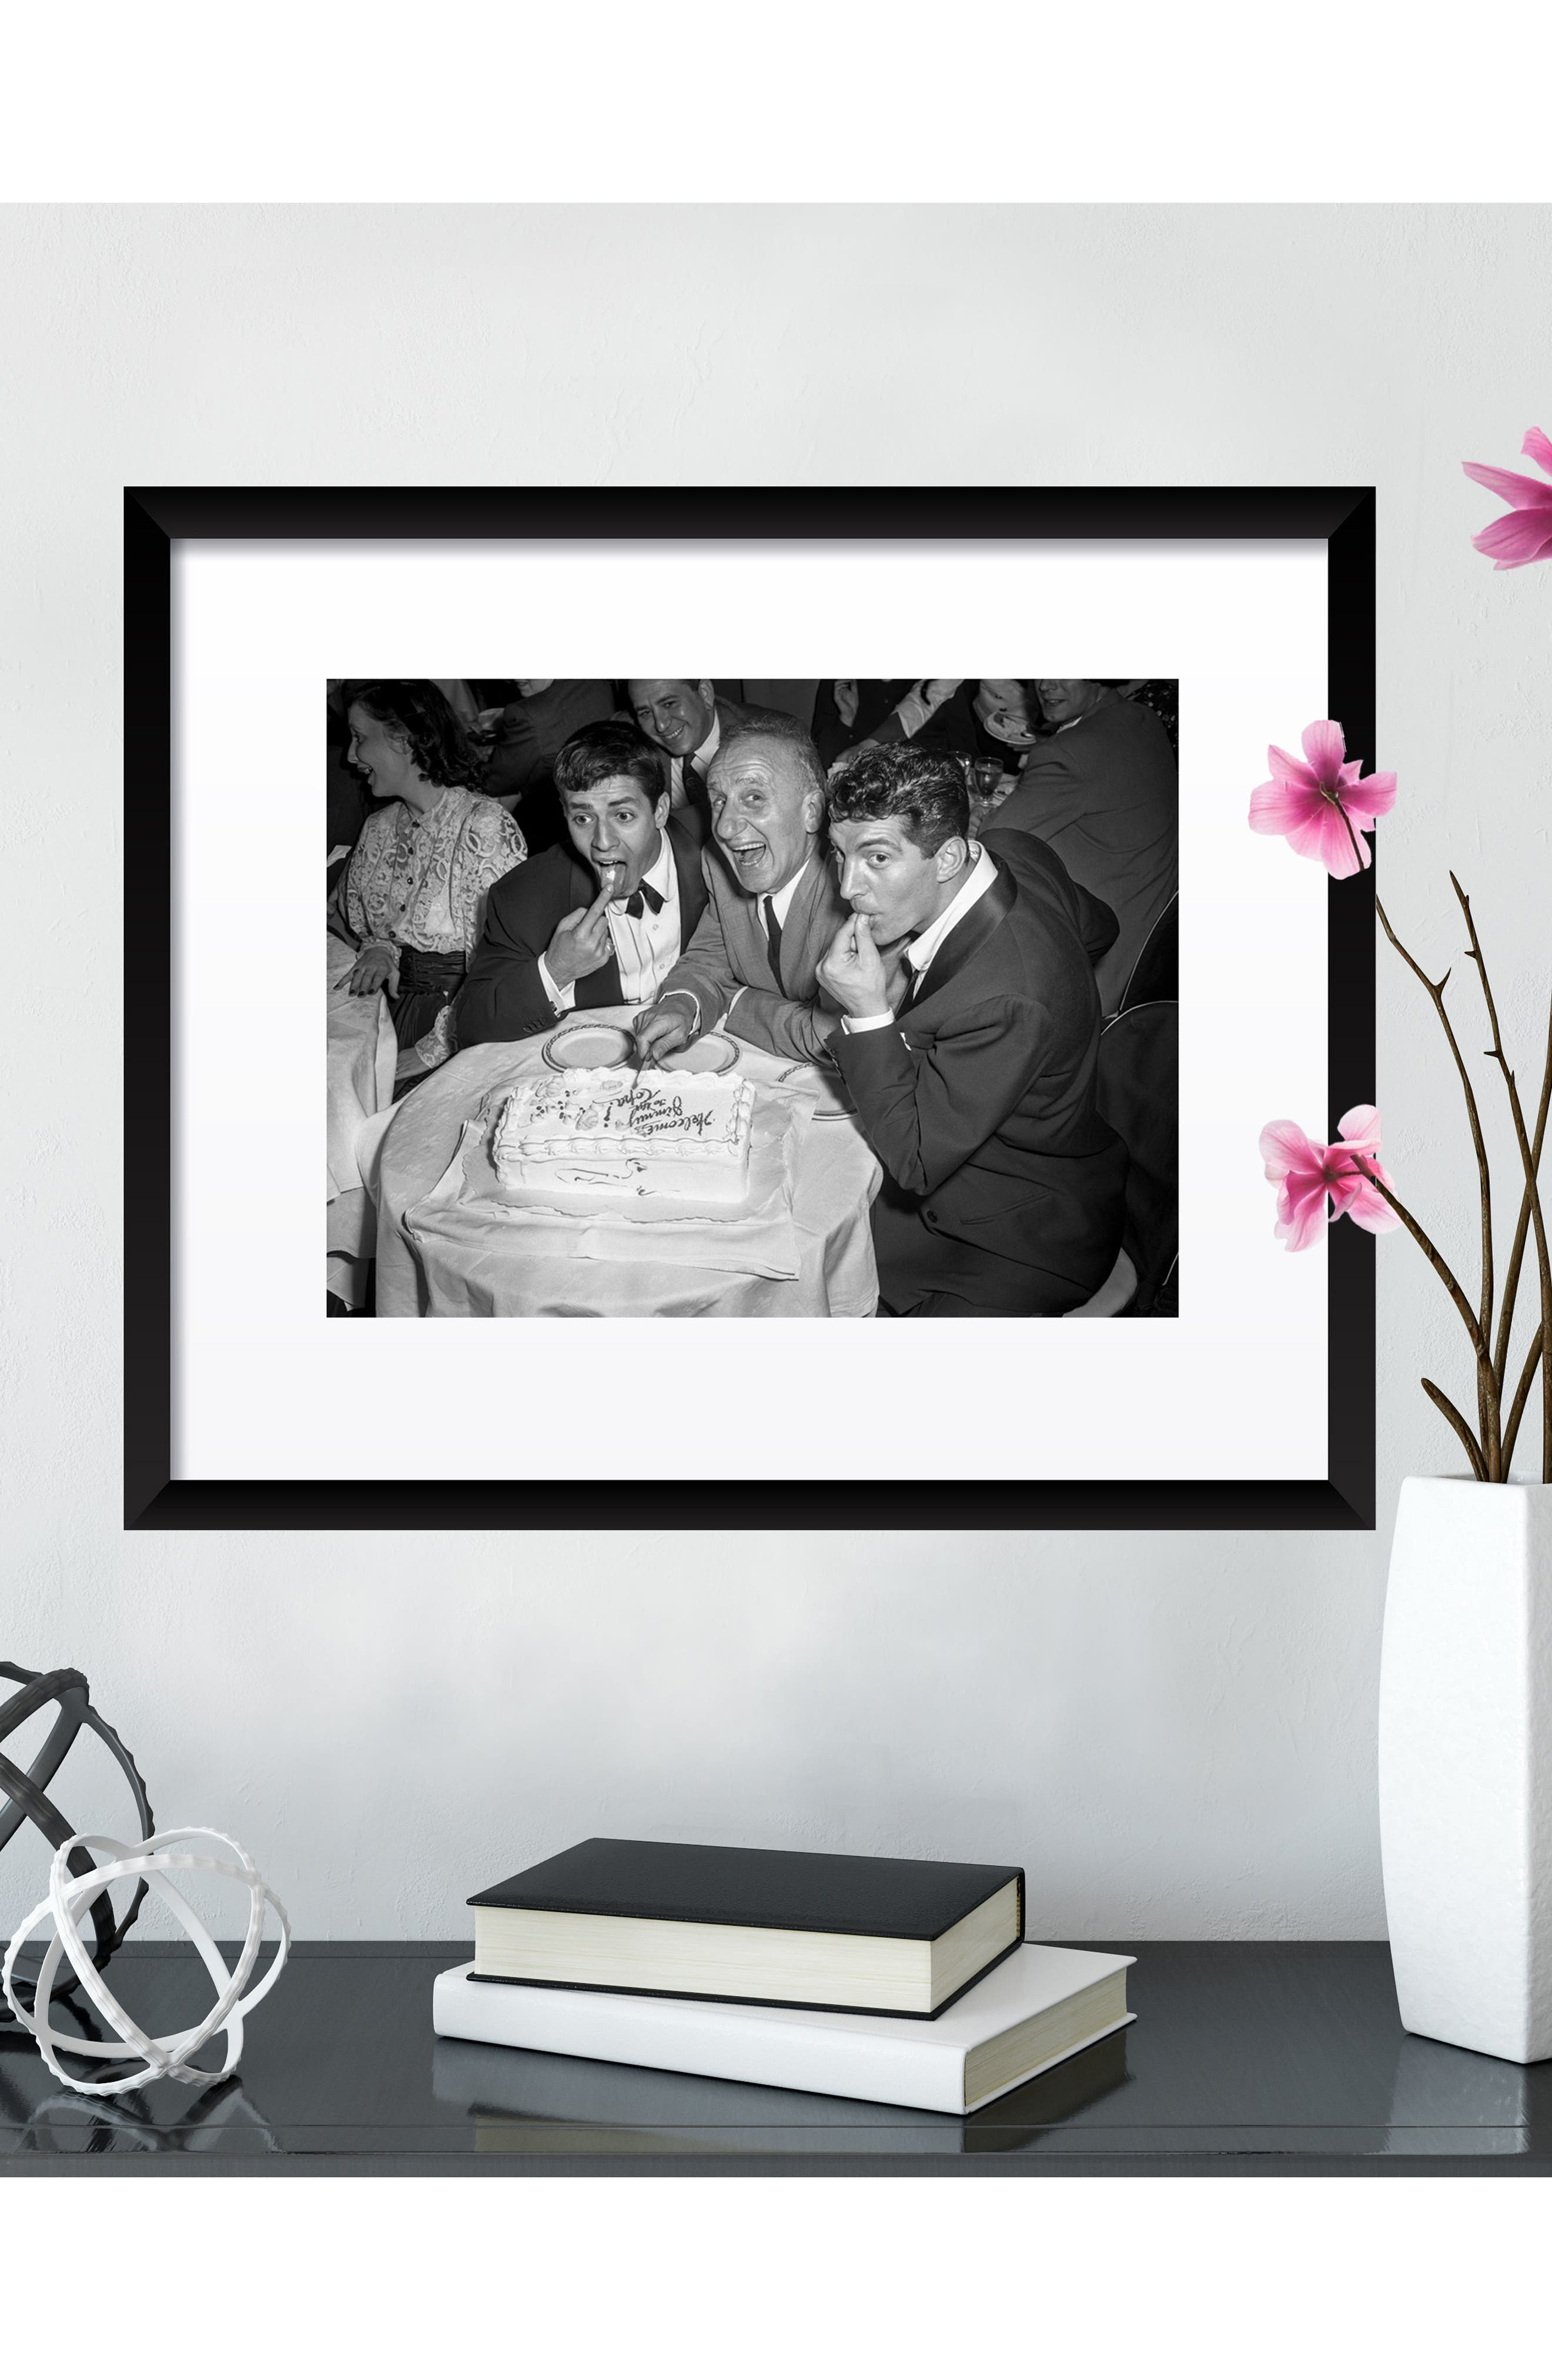 Jerry & Dean with Jimmy Durante Fine Art Print,                             Alternate thumbnail 3, color,                             Black